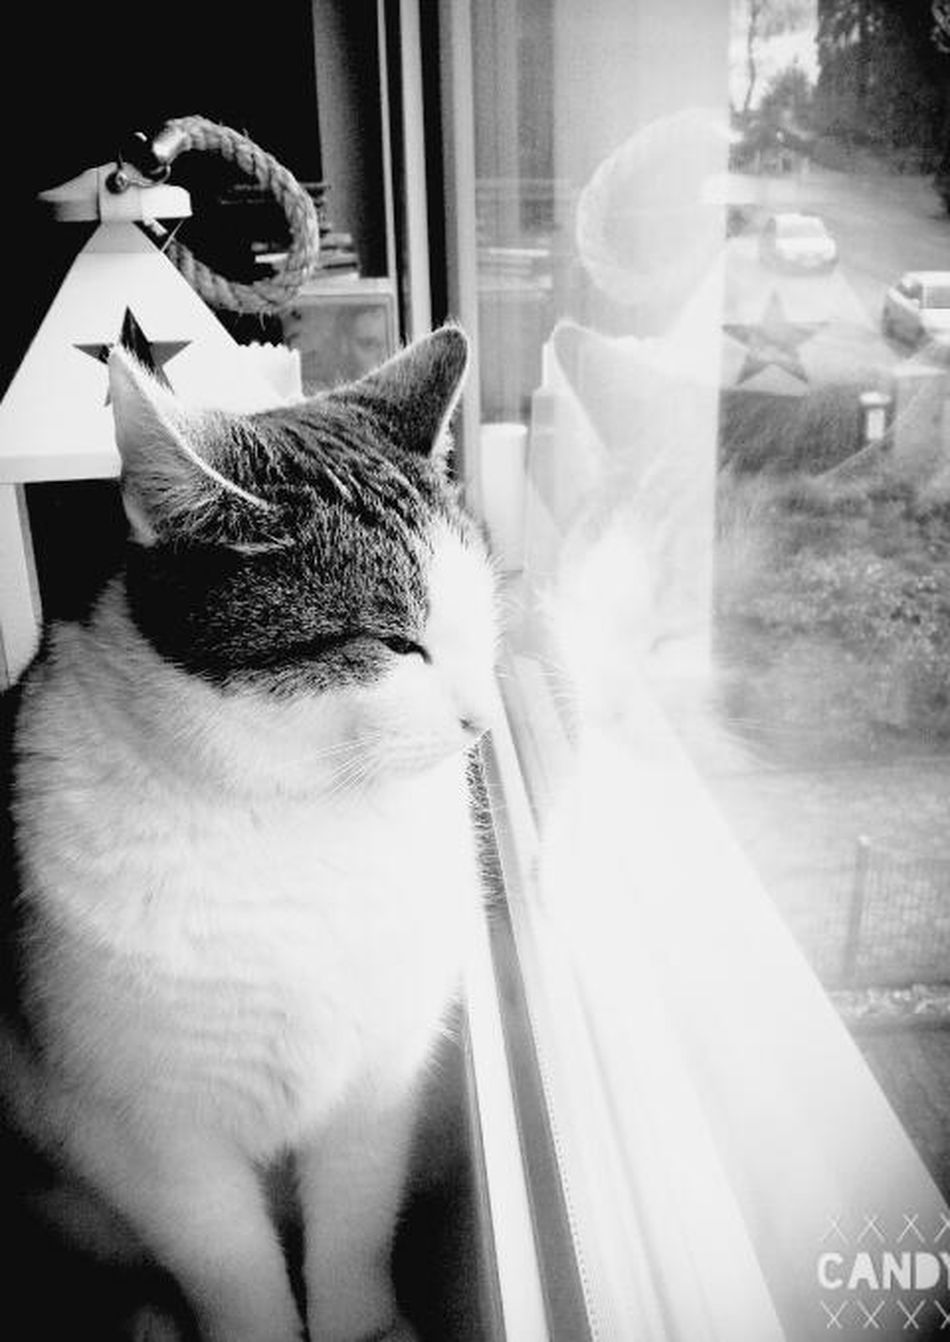 My cat♡ Cat♡ Cat Eye4photography  EyeEm Best Shots Black And White Blackandwhite Photography Blackandwhite Teflection Window Chilling Love ♥ I Love My Cat Love My Cat I Love My Cat♥